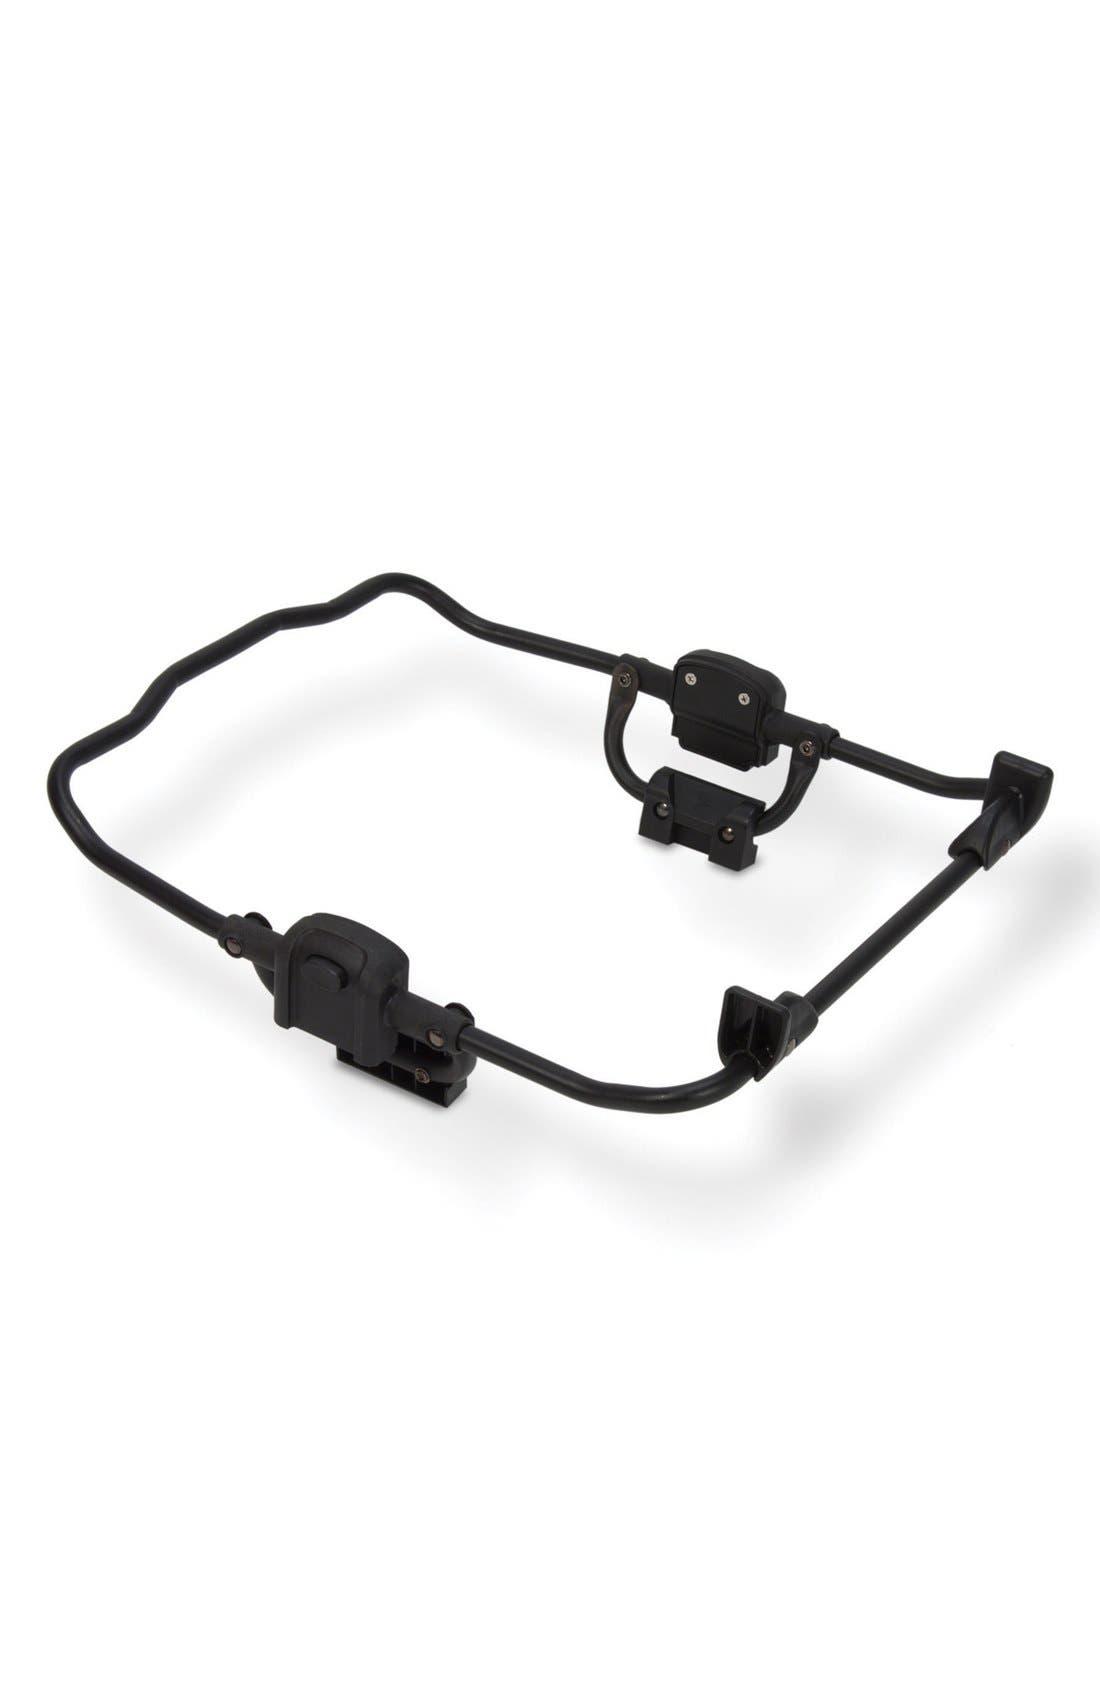 VISTA & CRUZ Stroller to Chicco<sup>®</sup> Car Seat Adapter,                             Main thumbnail 1, color,                             BLACK